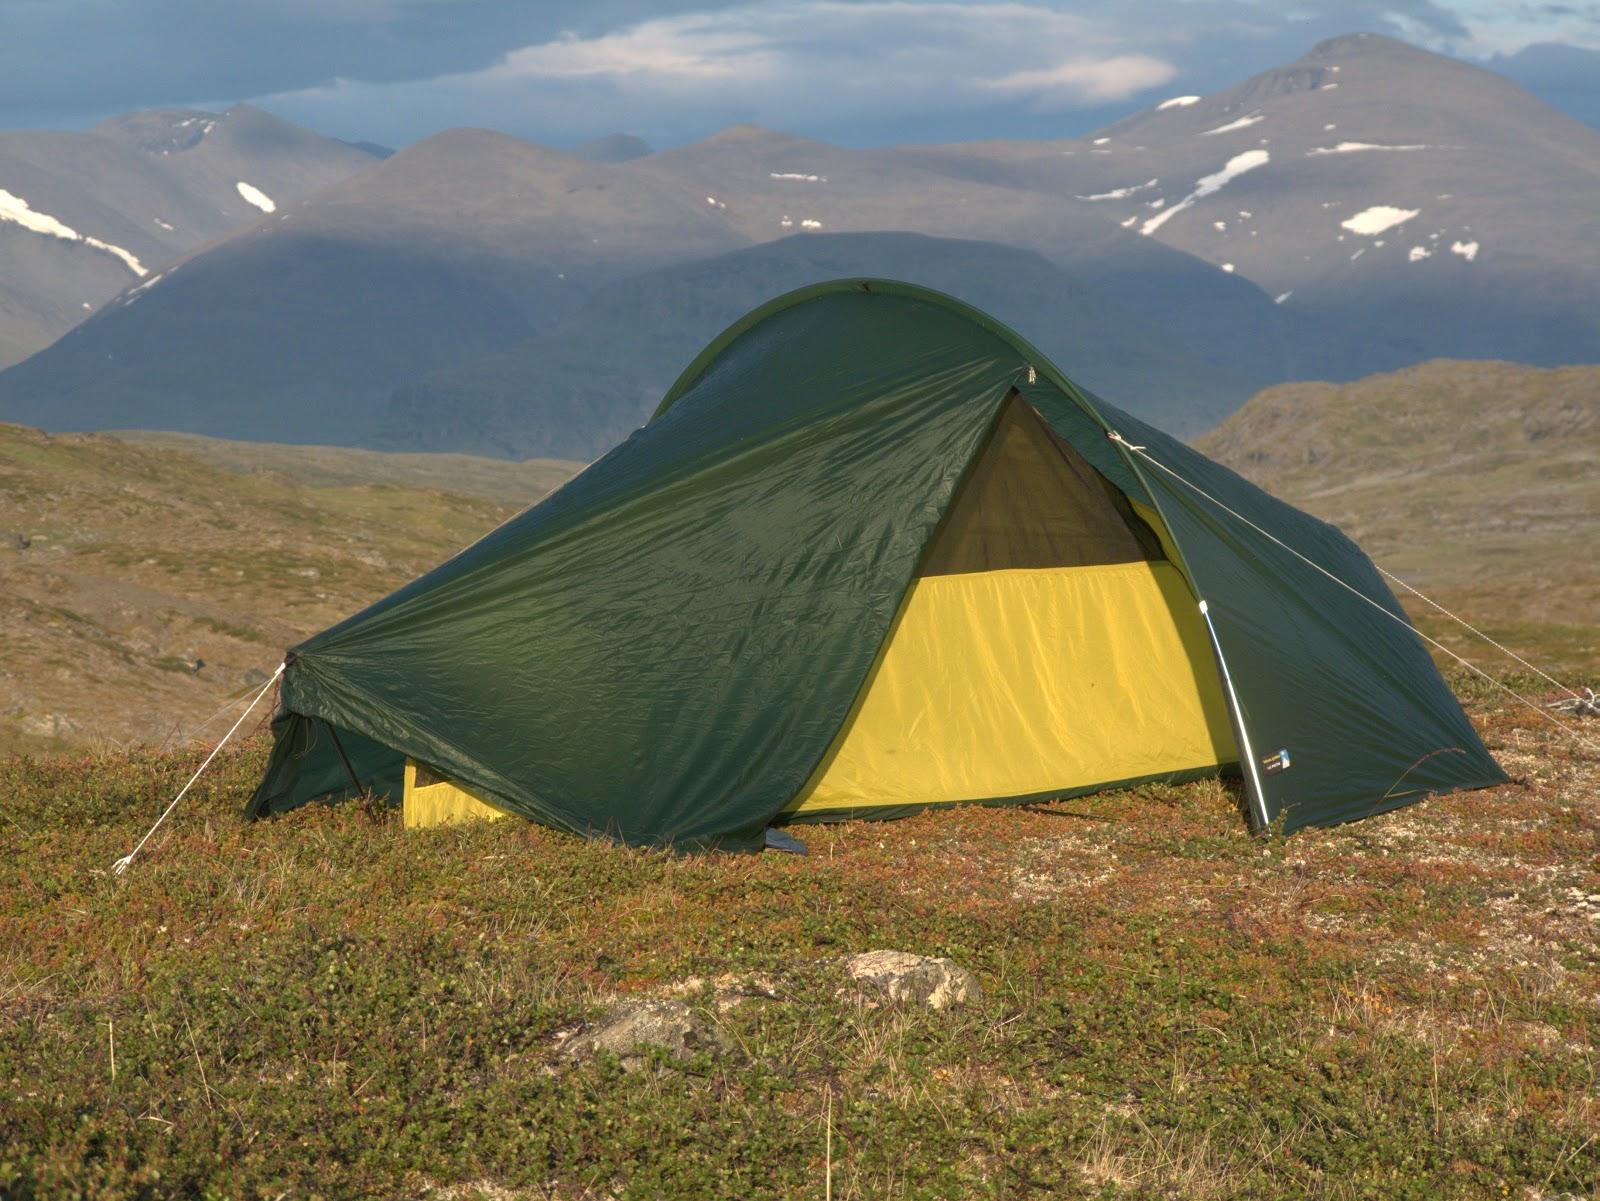 Terra Nova Laser Photon in Håikanvagge Swedish Lapland & Coast to Coast Sweden: Gear - Shelter for C2C